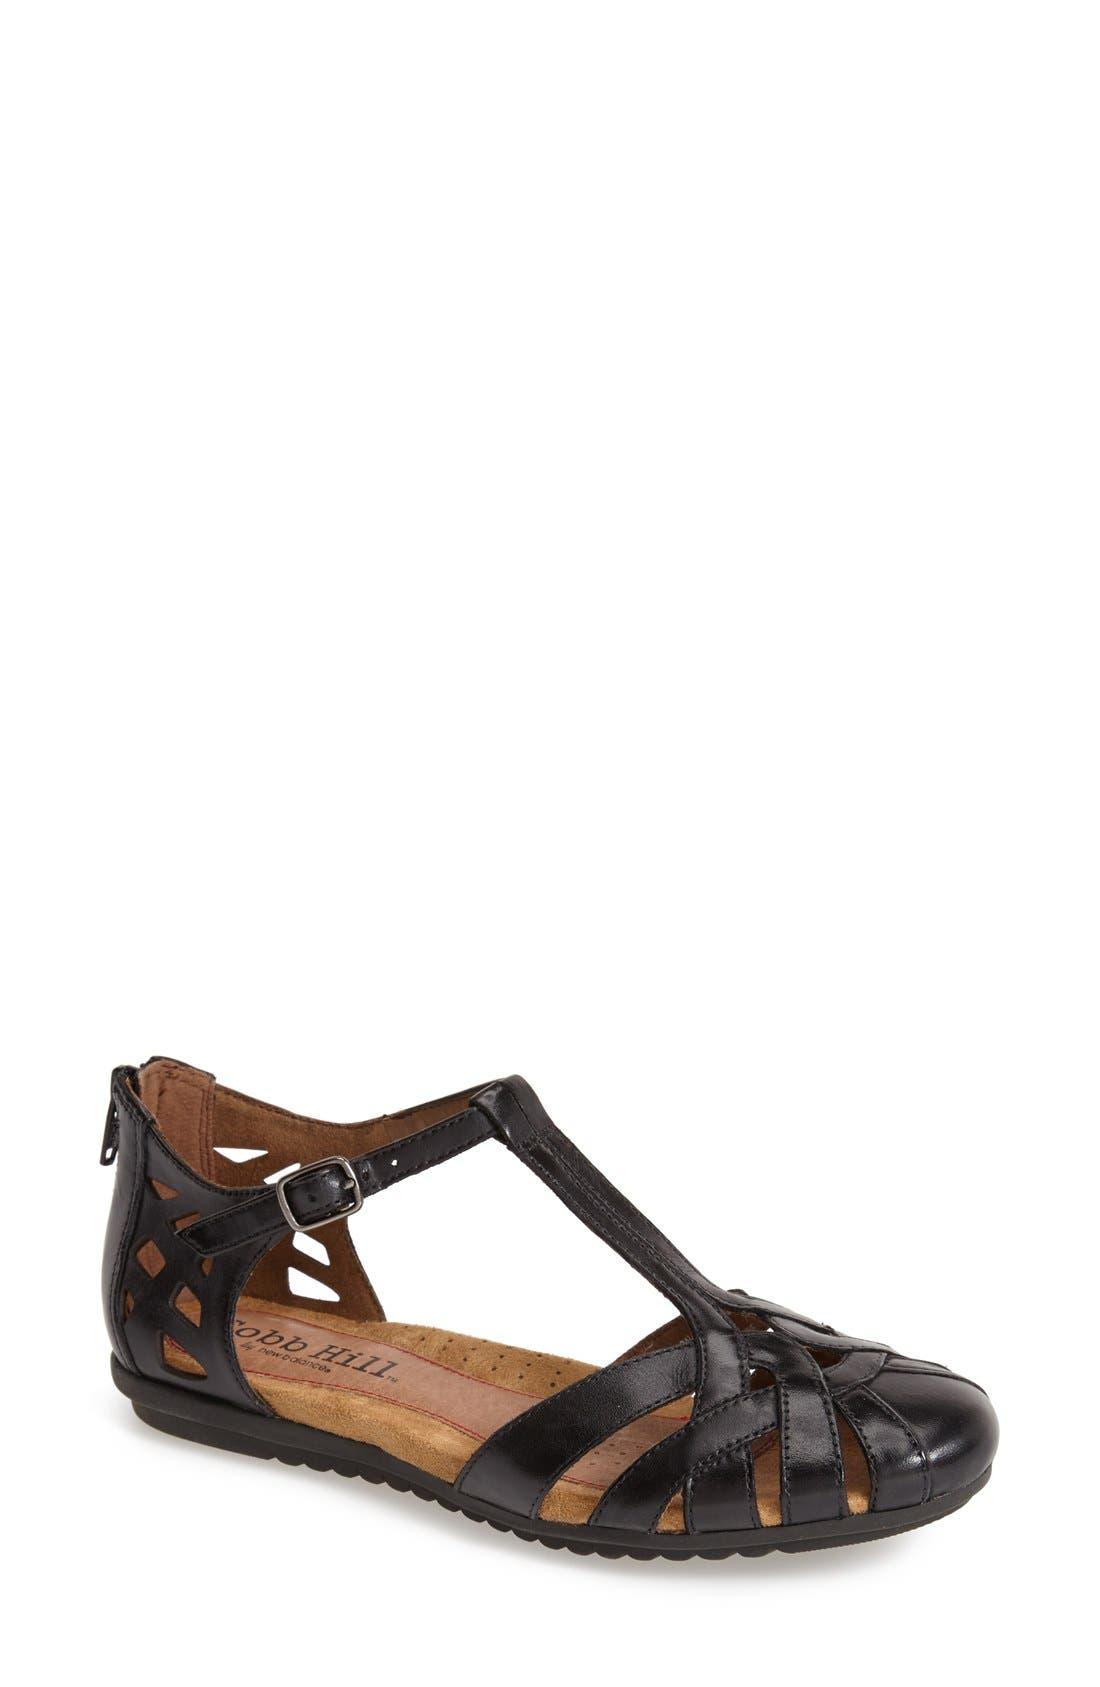 Alternate Image 1 Selected - Rockport Cobb Hill 'Ireland' Leather Sandal (Women)